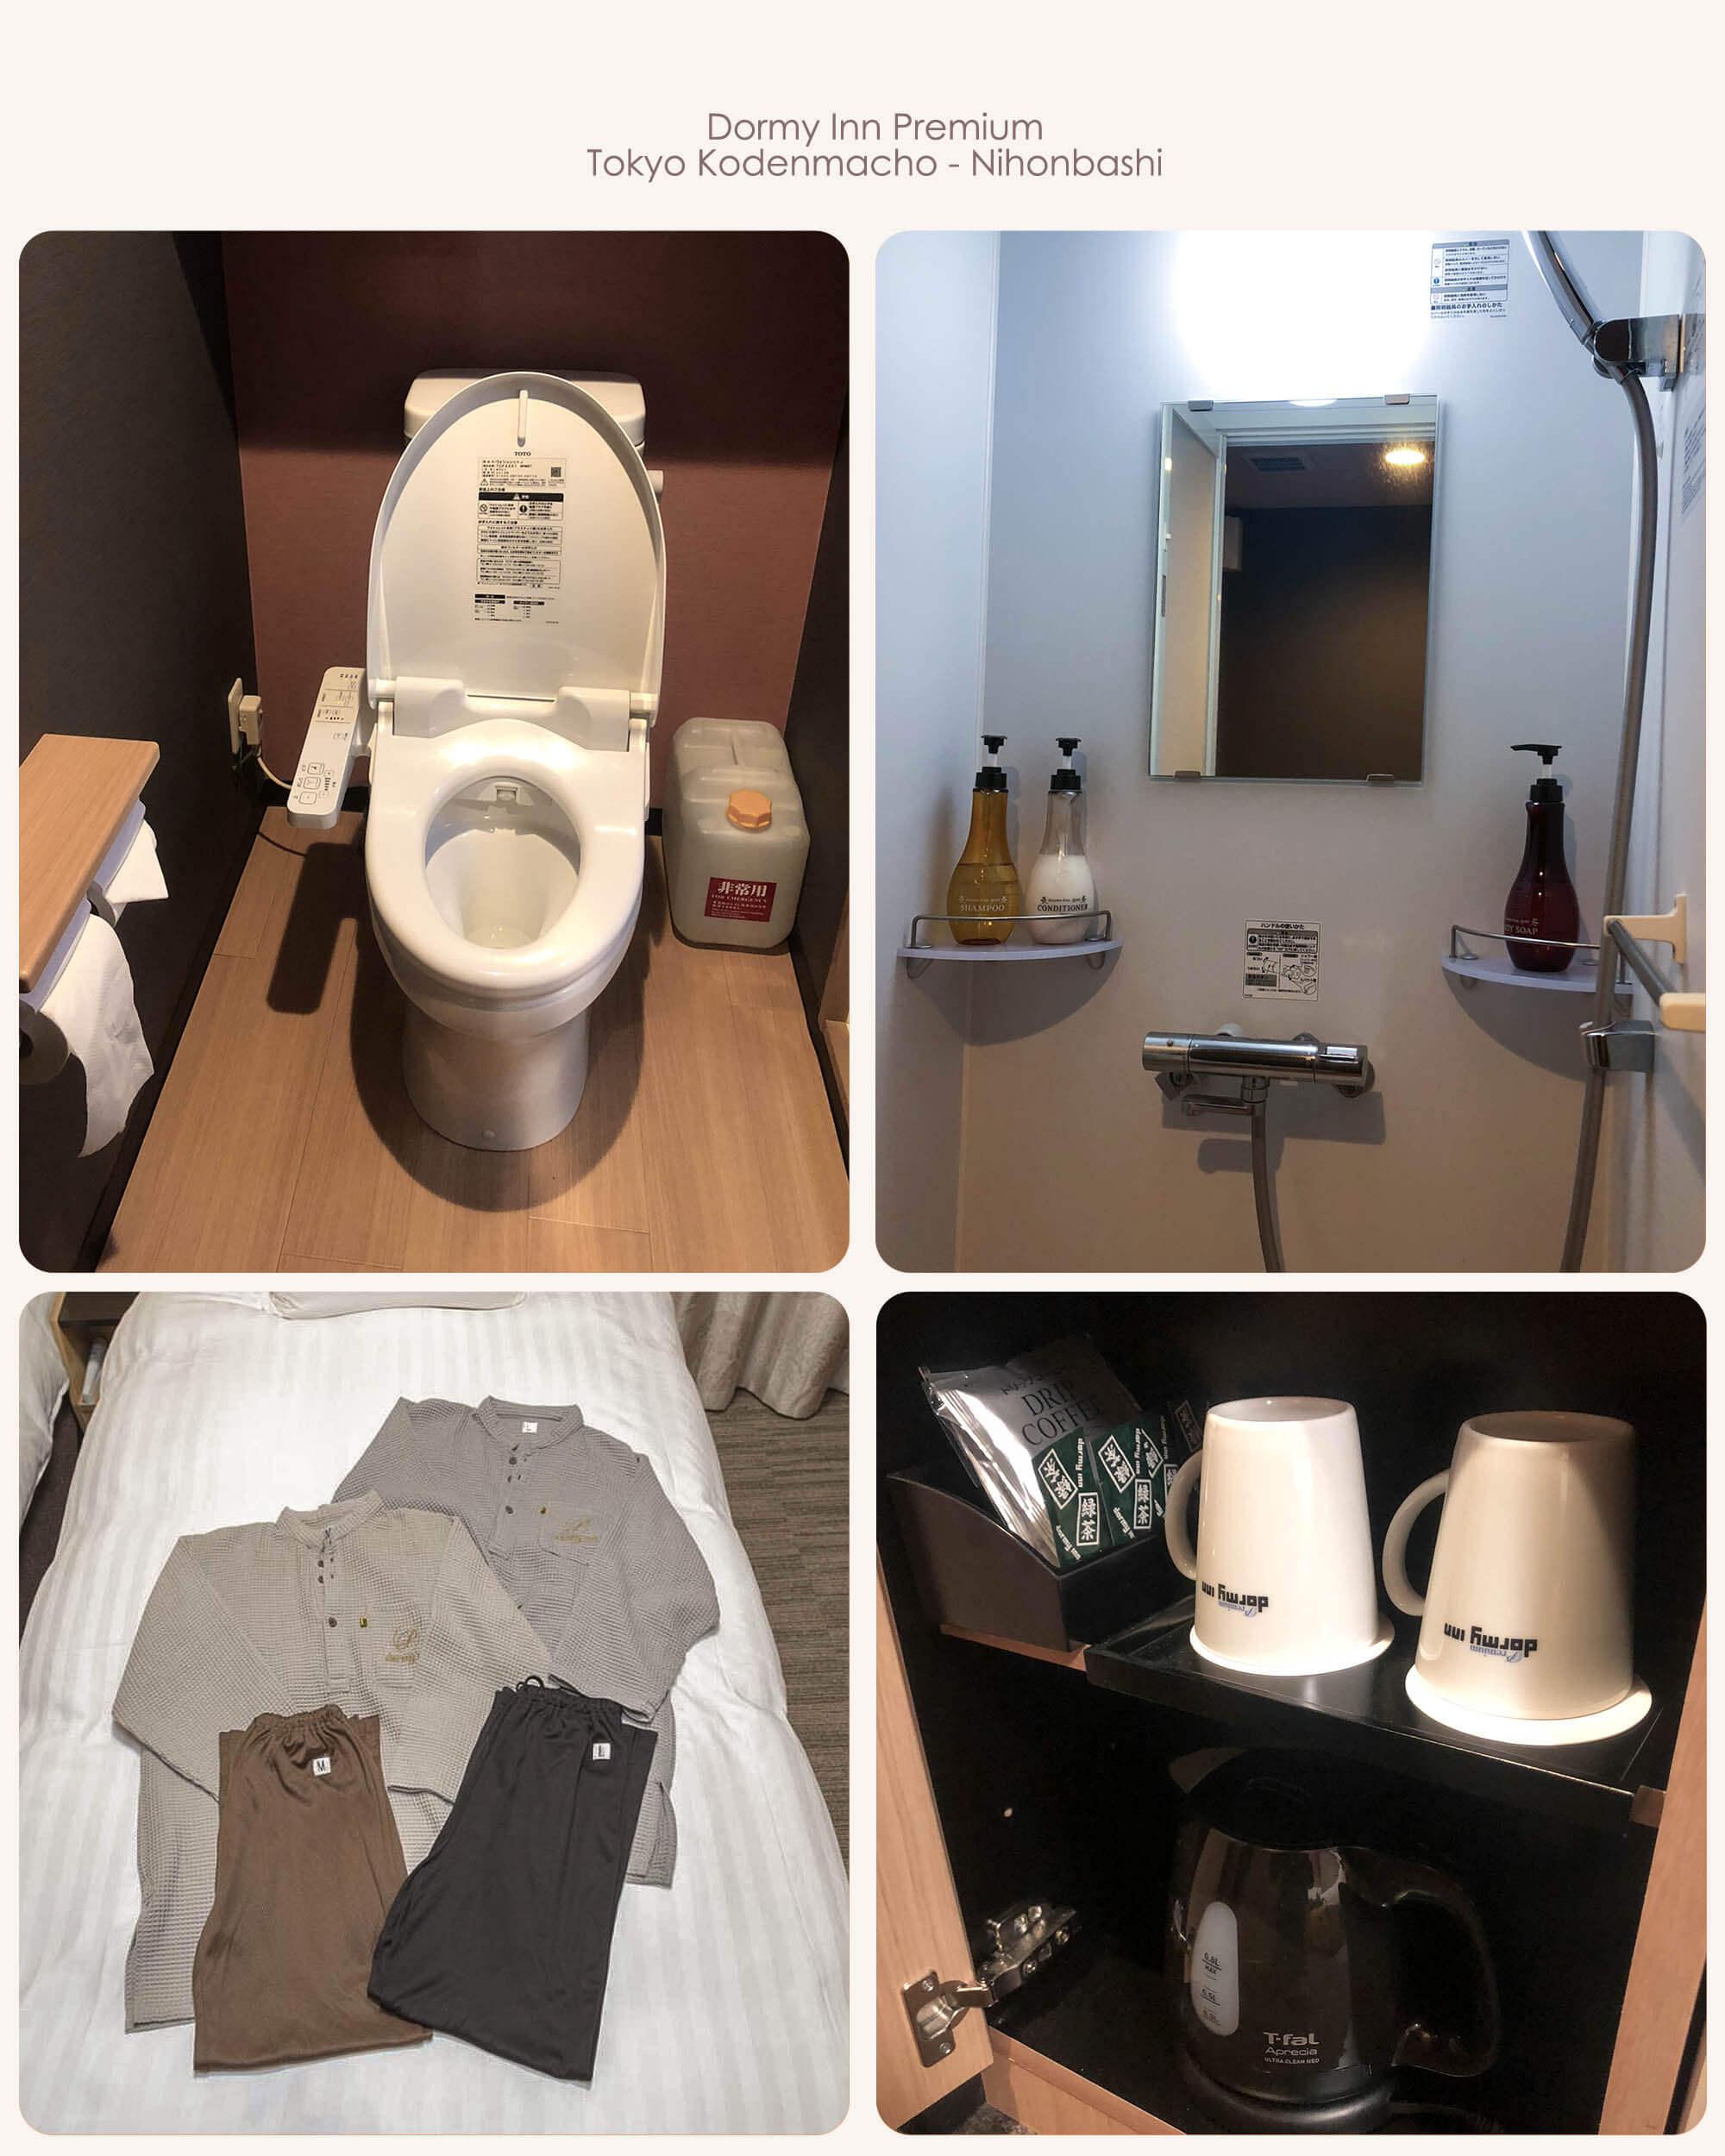 Dormyinn房間設施&廁所